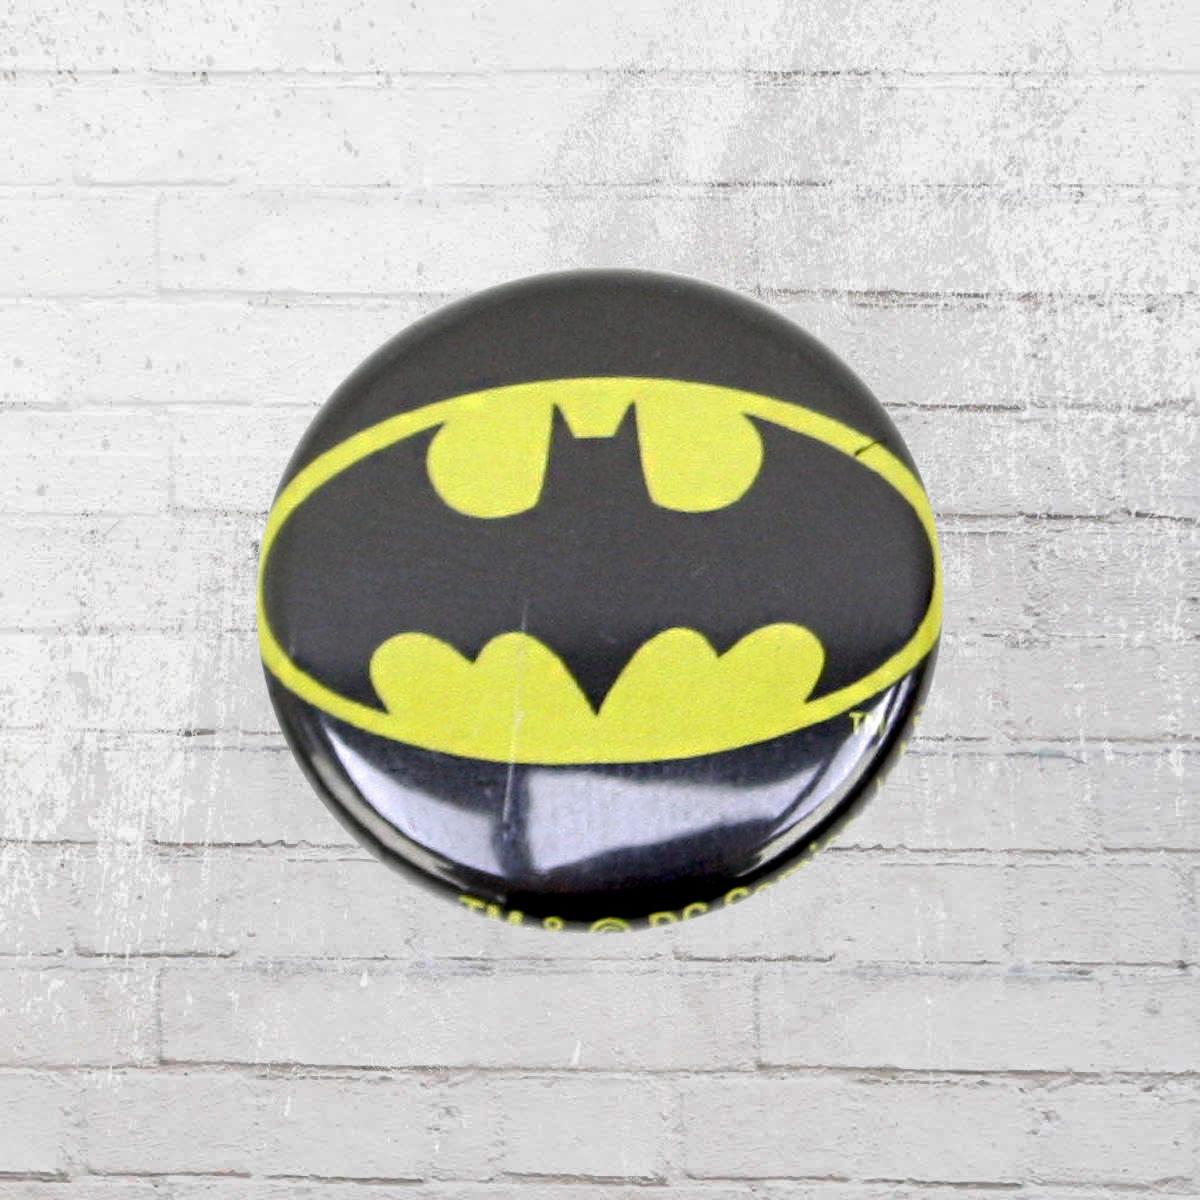 jetzt bestellen logoshirt comic anstecker button dc batman logo schwarz gelb krasse. Black Bedroom Furniture Sets. Home Design Ideas